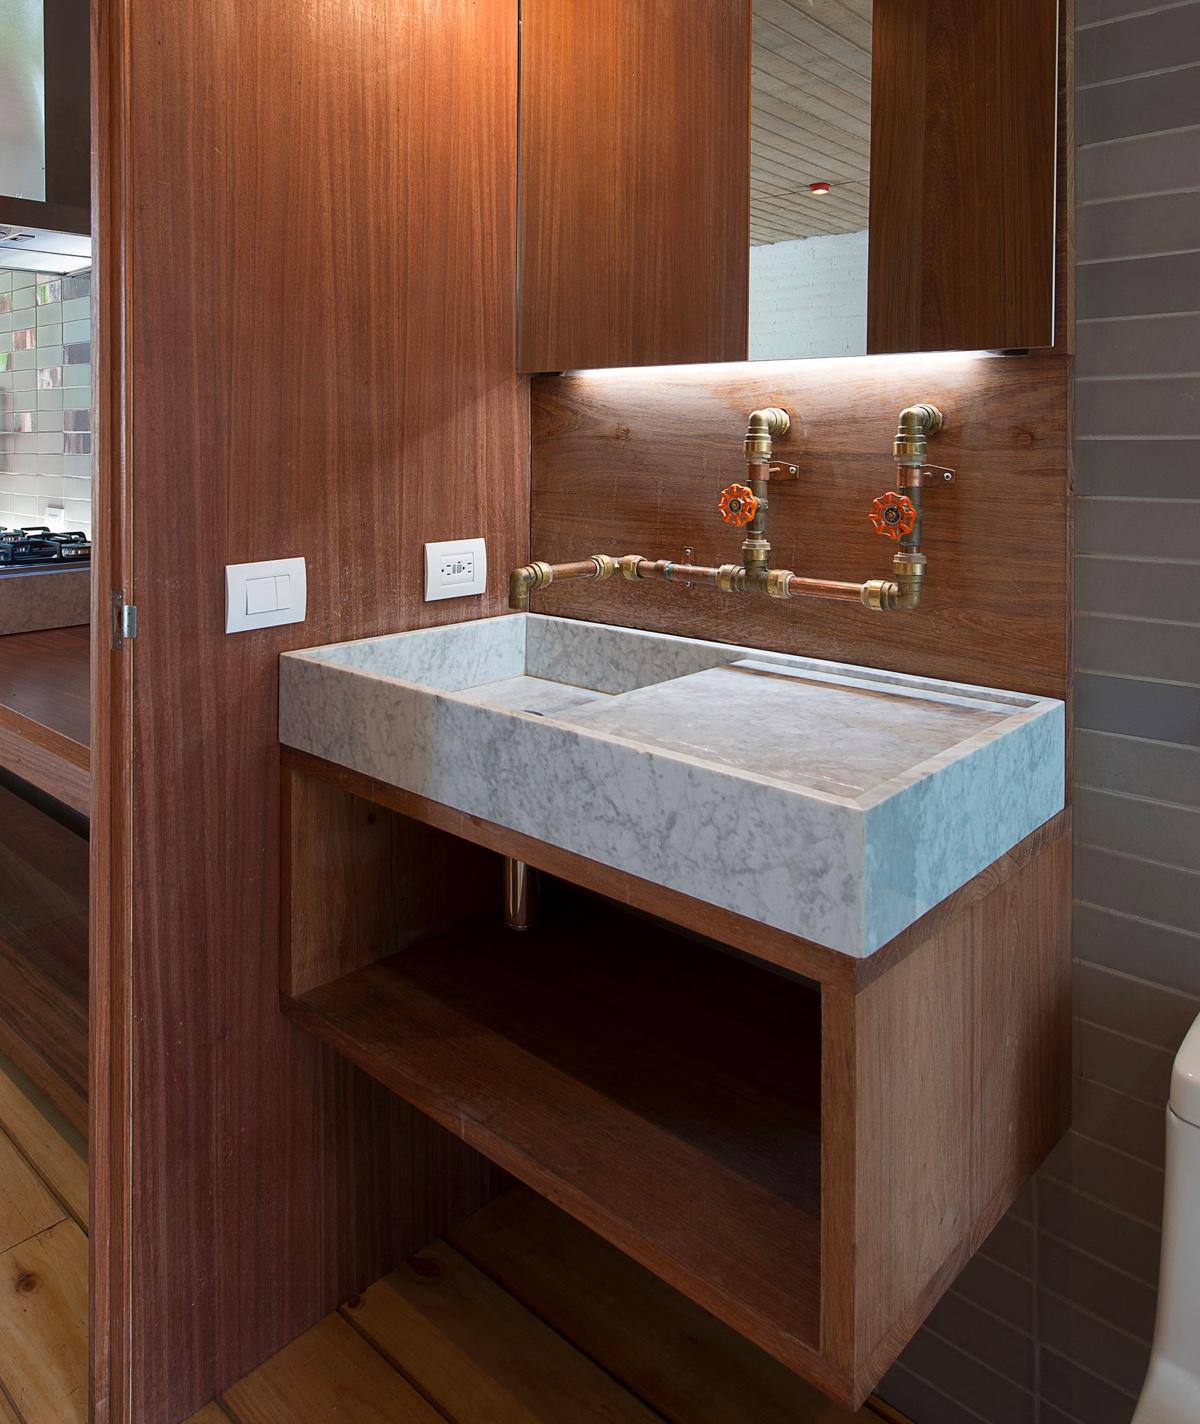 bathroom faucet and tapware